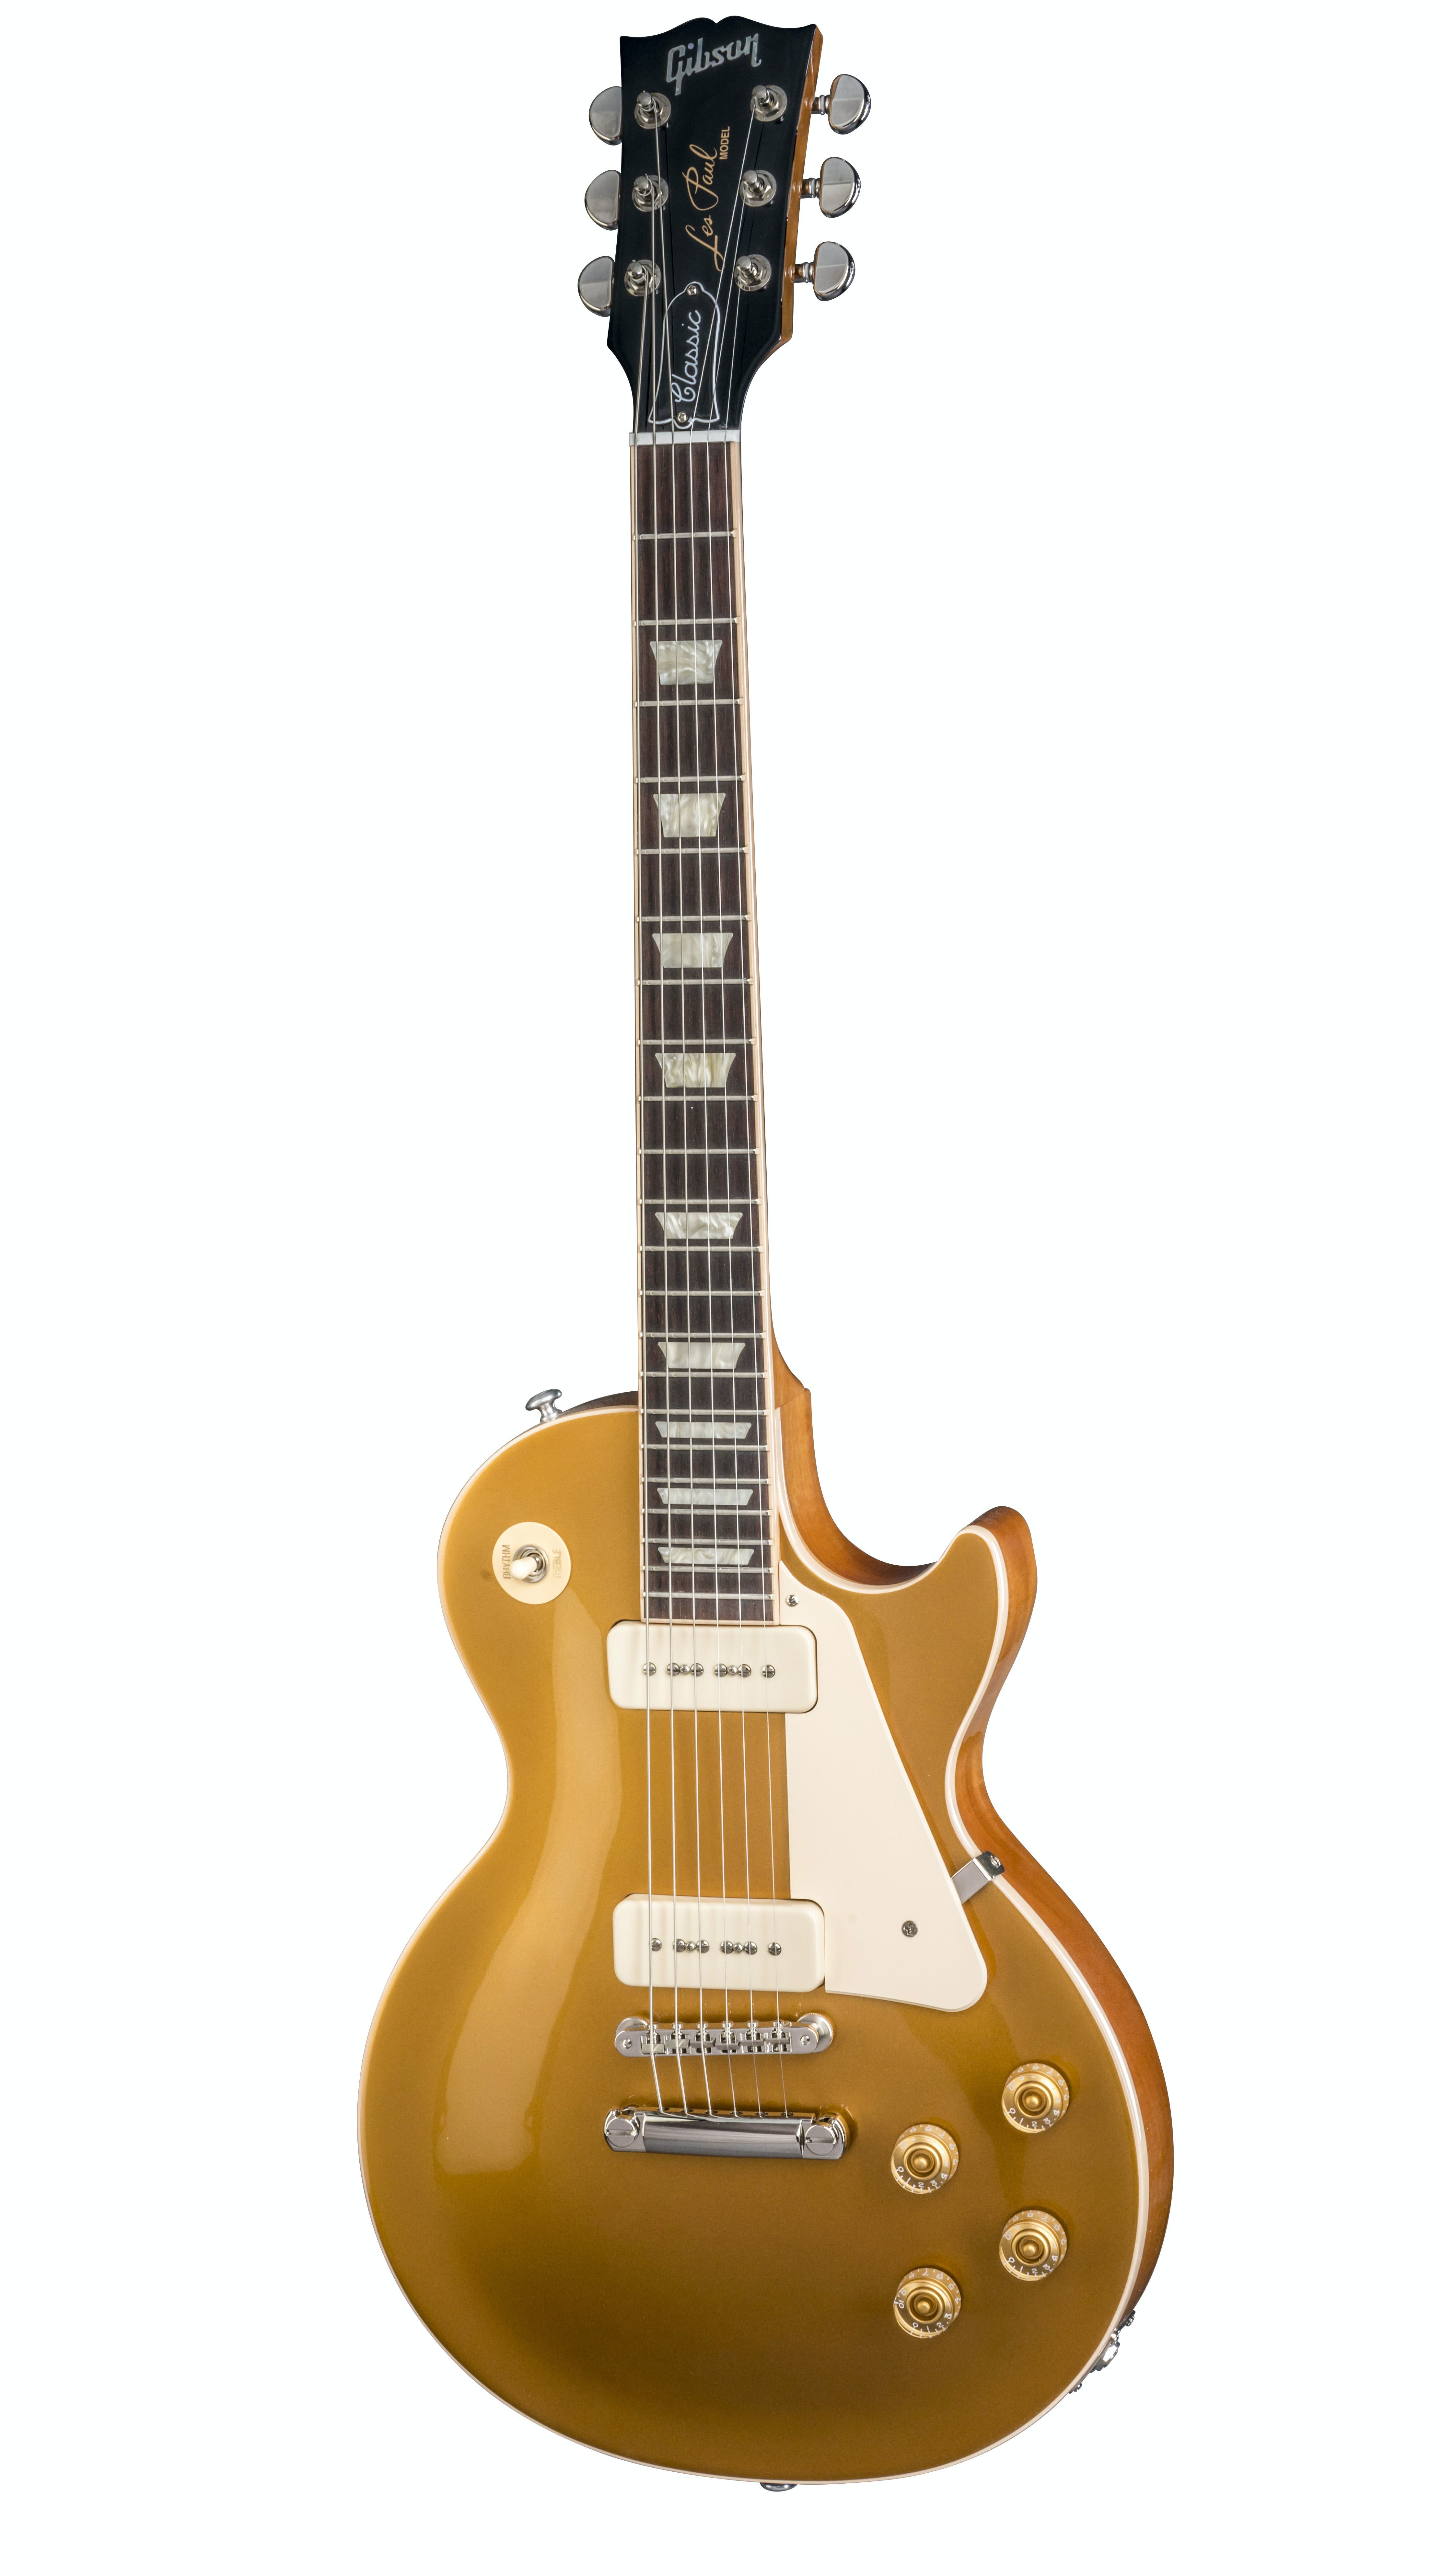 washburn x series electric guitar wiring diagram semi hollow electric guitar wiring diagram semi hollow body les paul wiring diagram | wiring library